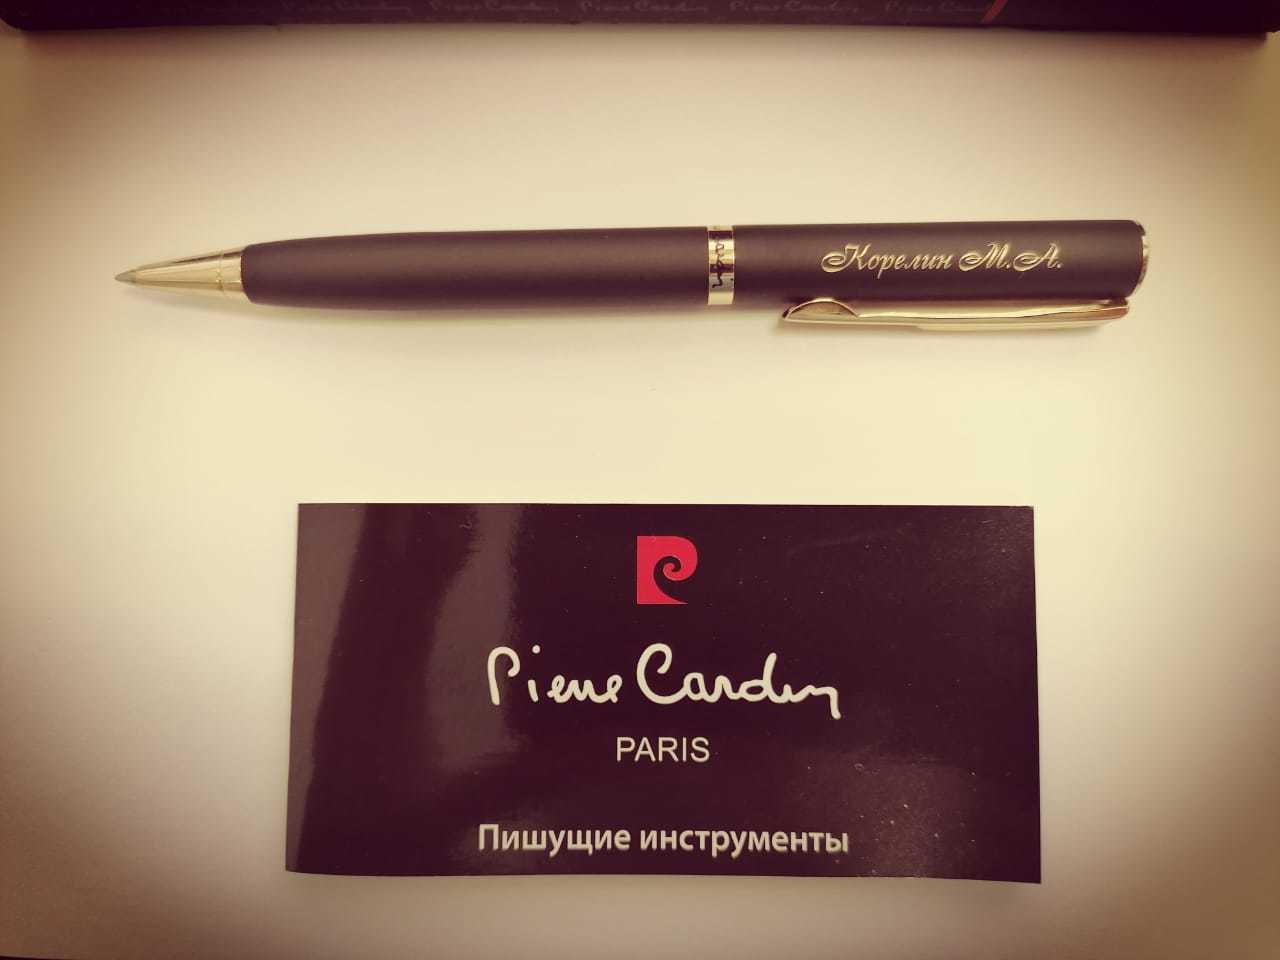 Пример № 8 (Шариковая) /  / Ручка: Pierre Cardin Eco / Место нанесения: № 7 / Шрифт: Cassandra / Артикул: PC0867BP